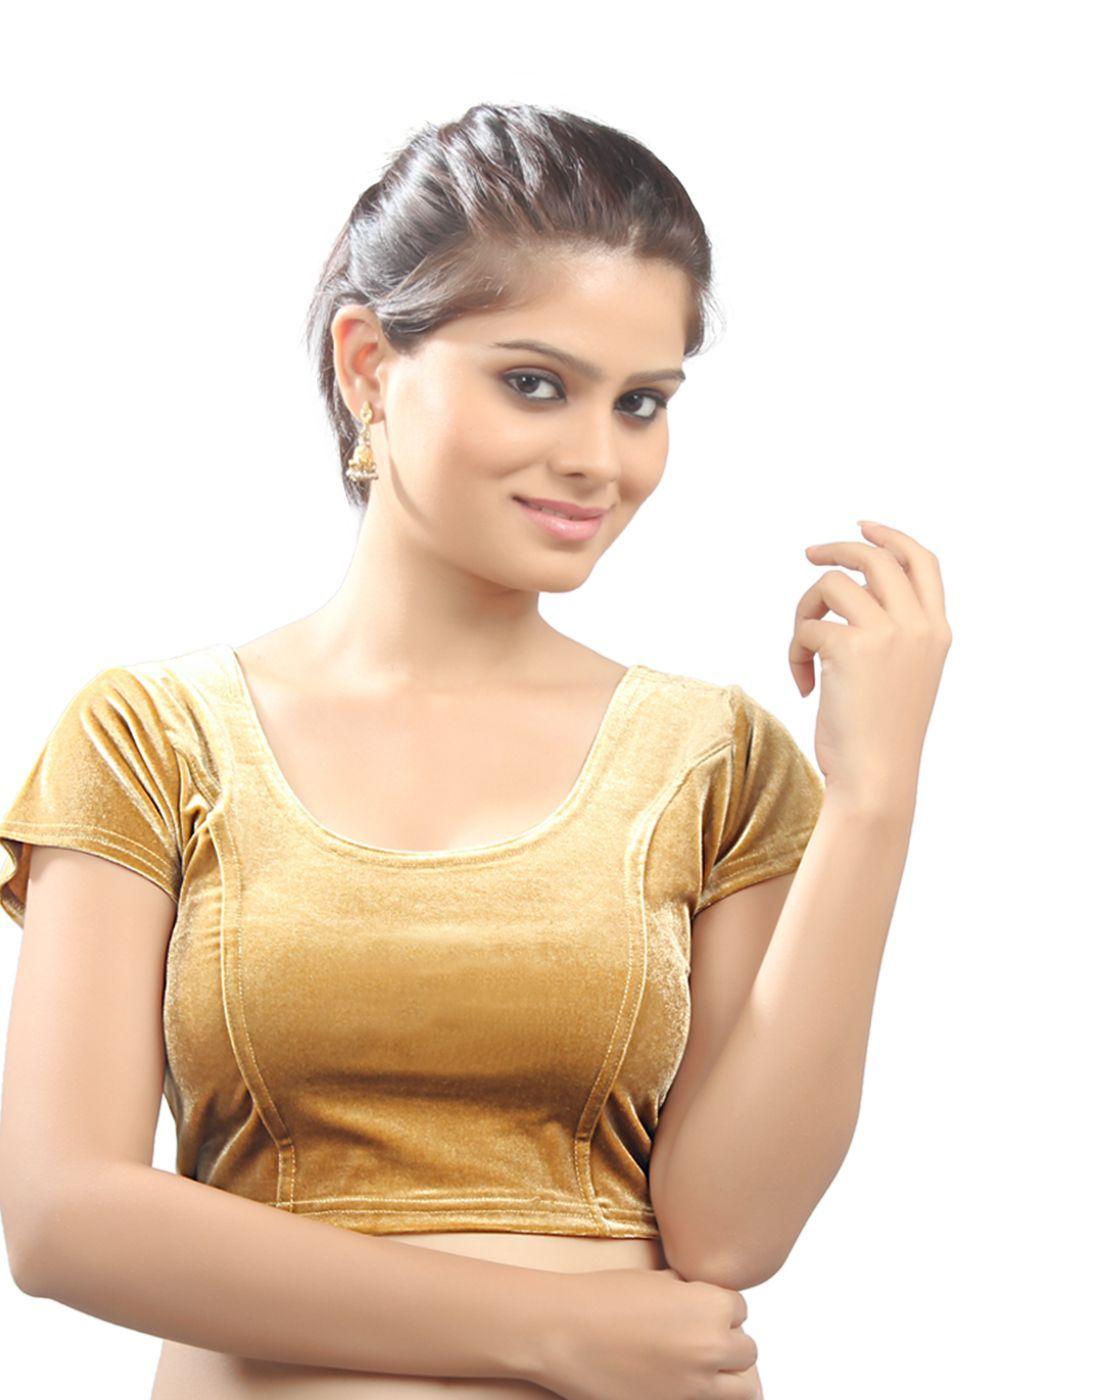 177f4534016734 Gold Velvet Stretchable Blouse. Size xL. - muhenera s - 293727